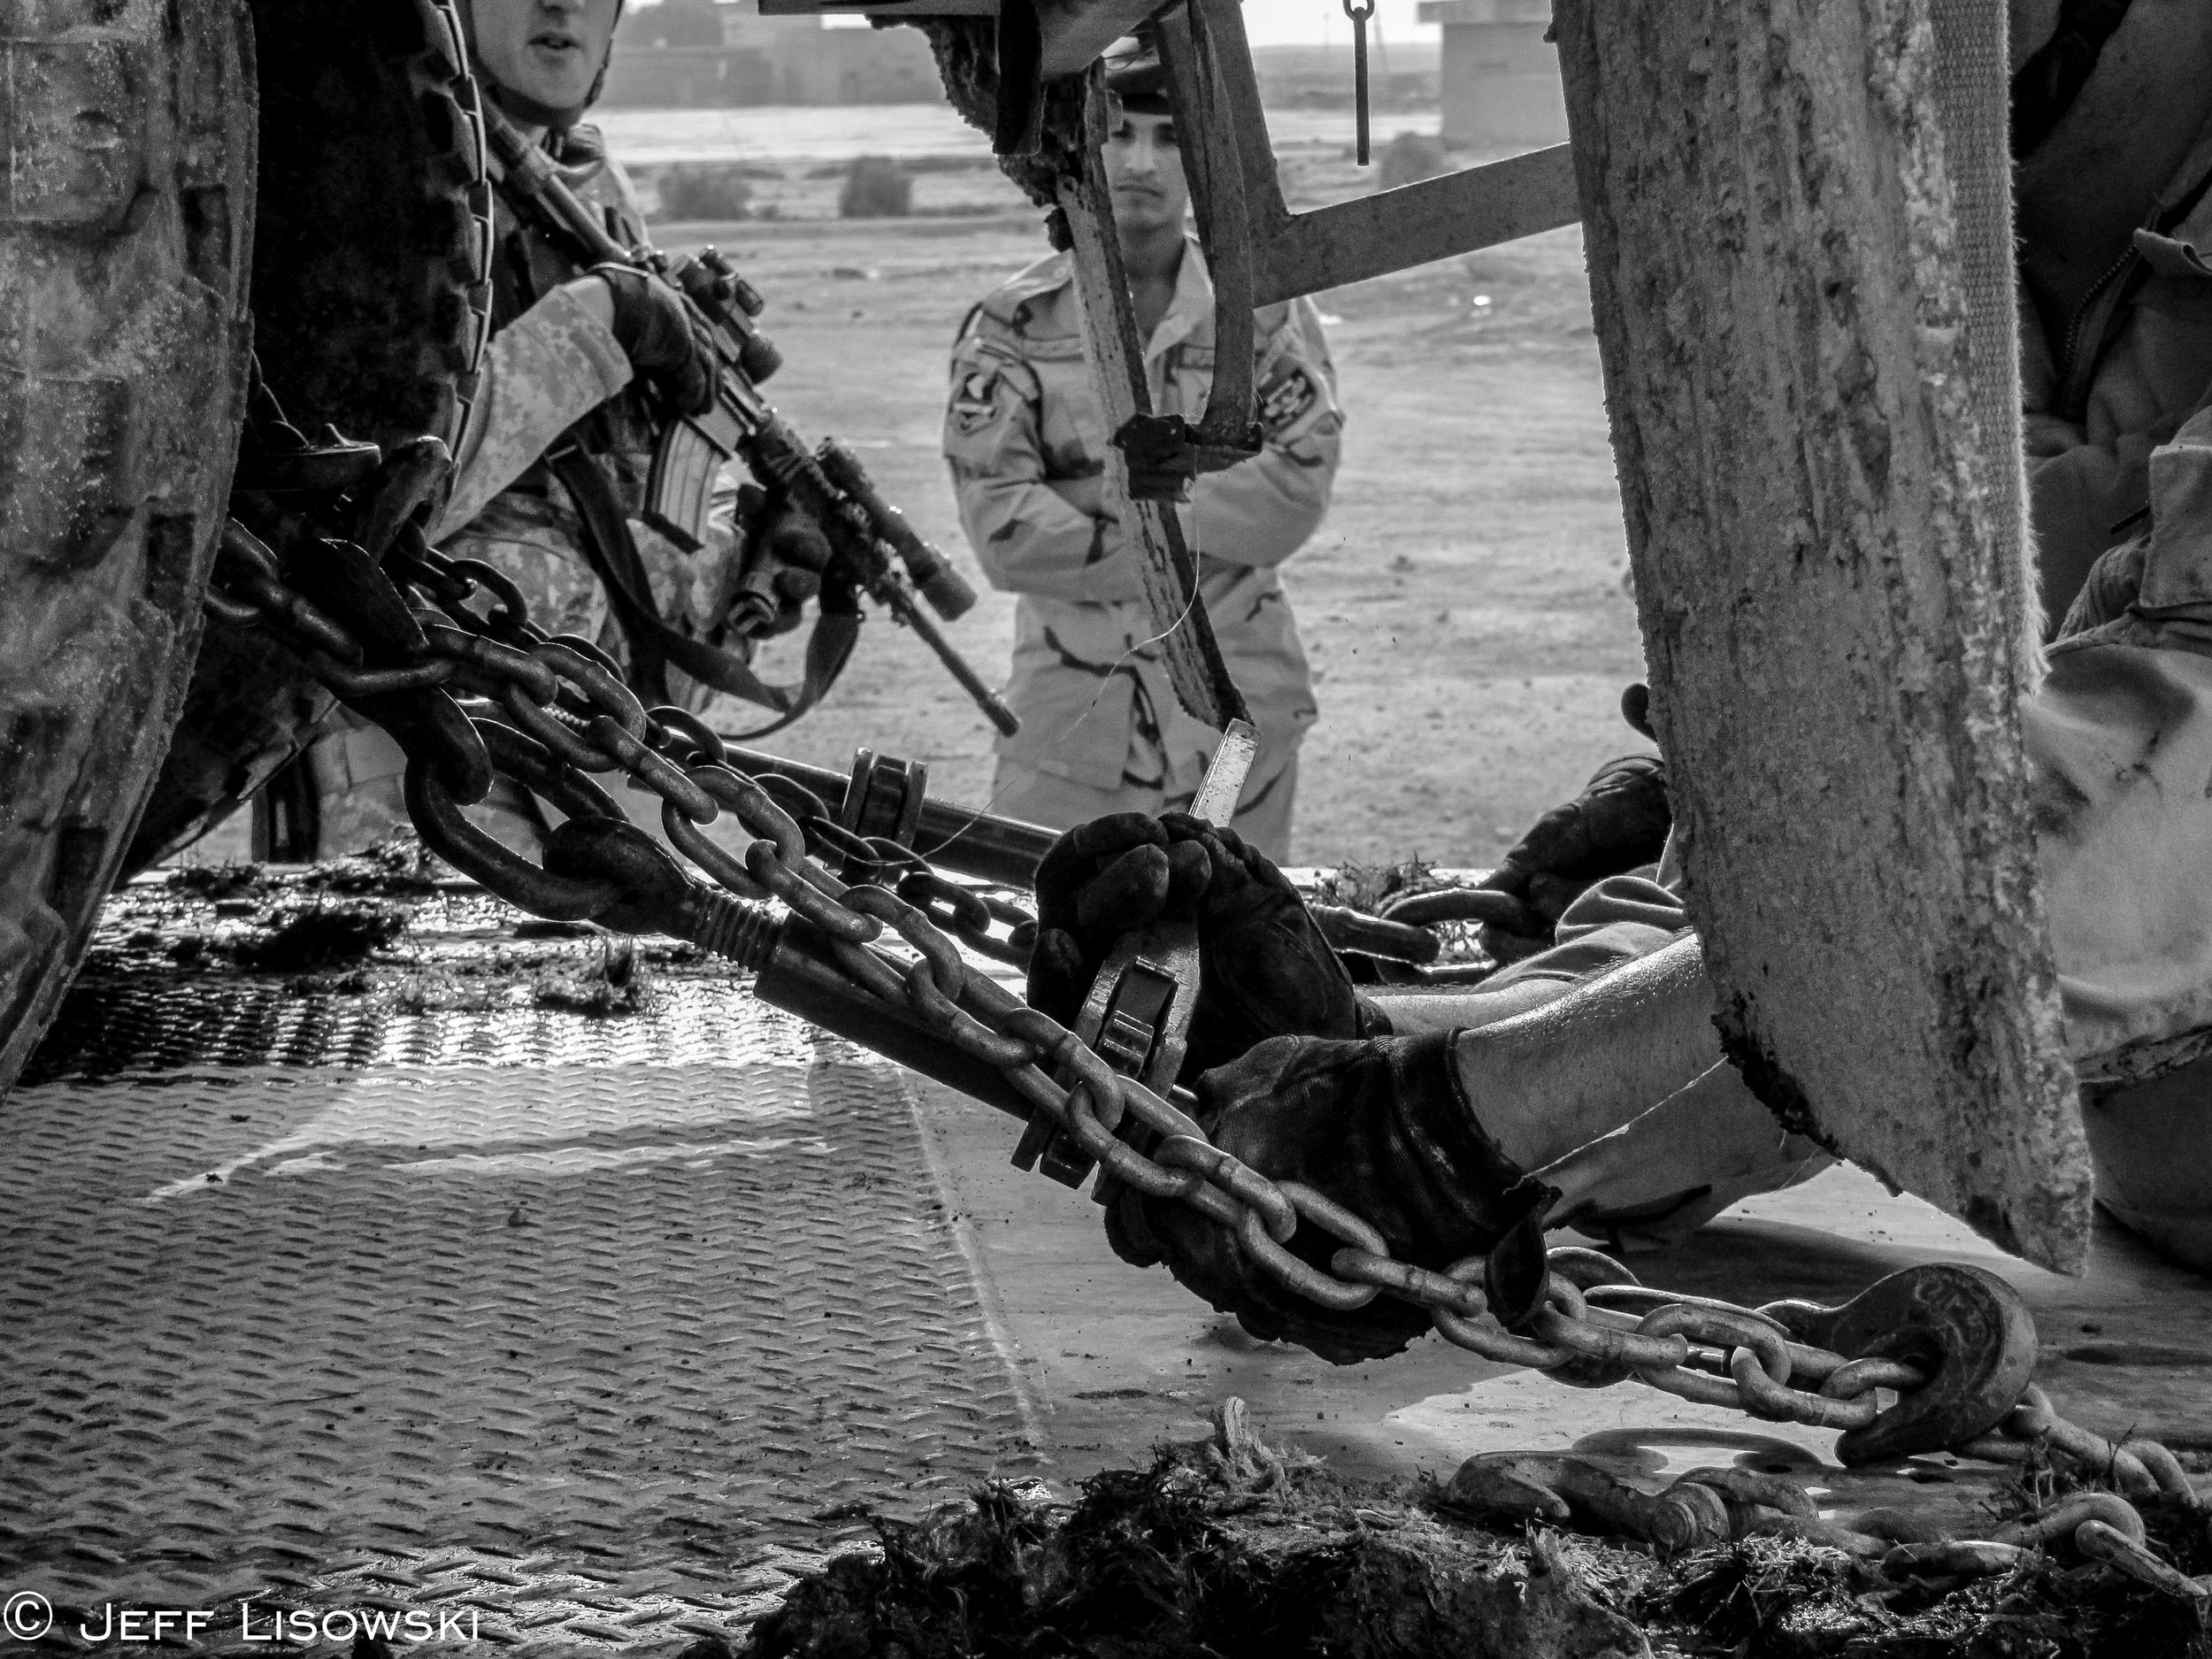 Tying down equipment on the east side of Nasiriyah. Summer of 2010.